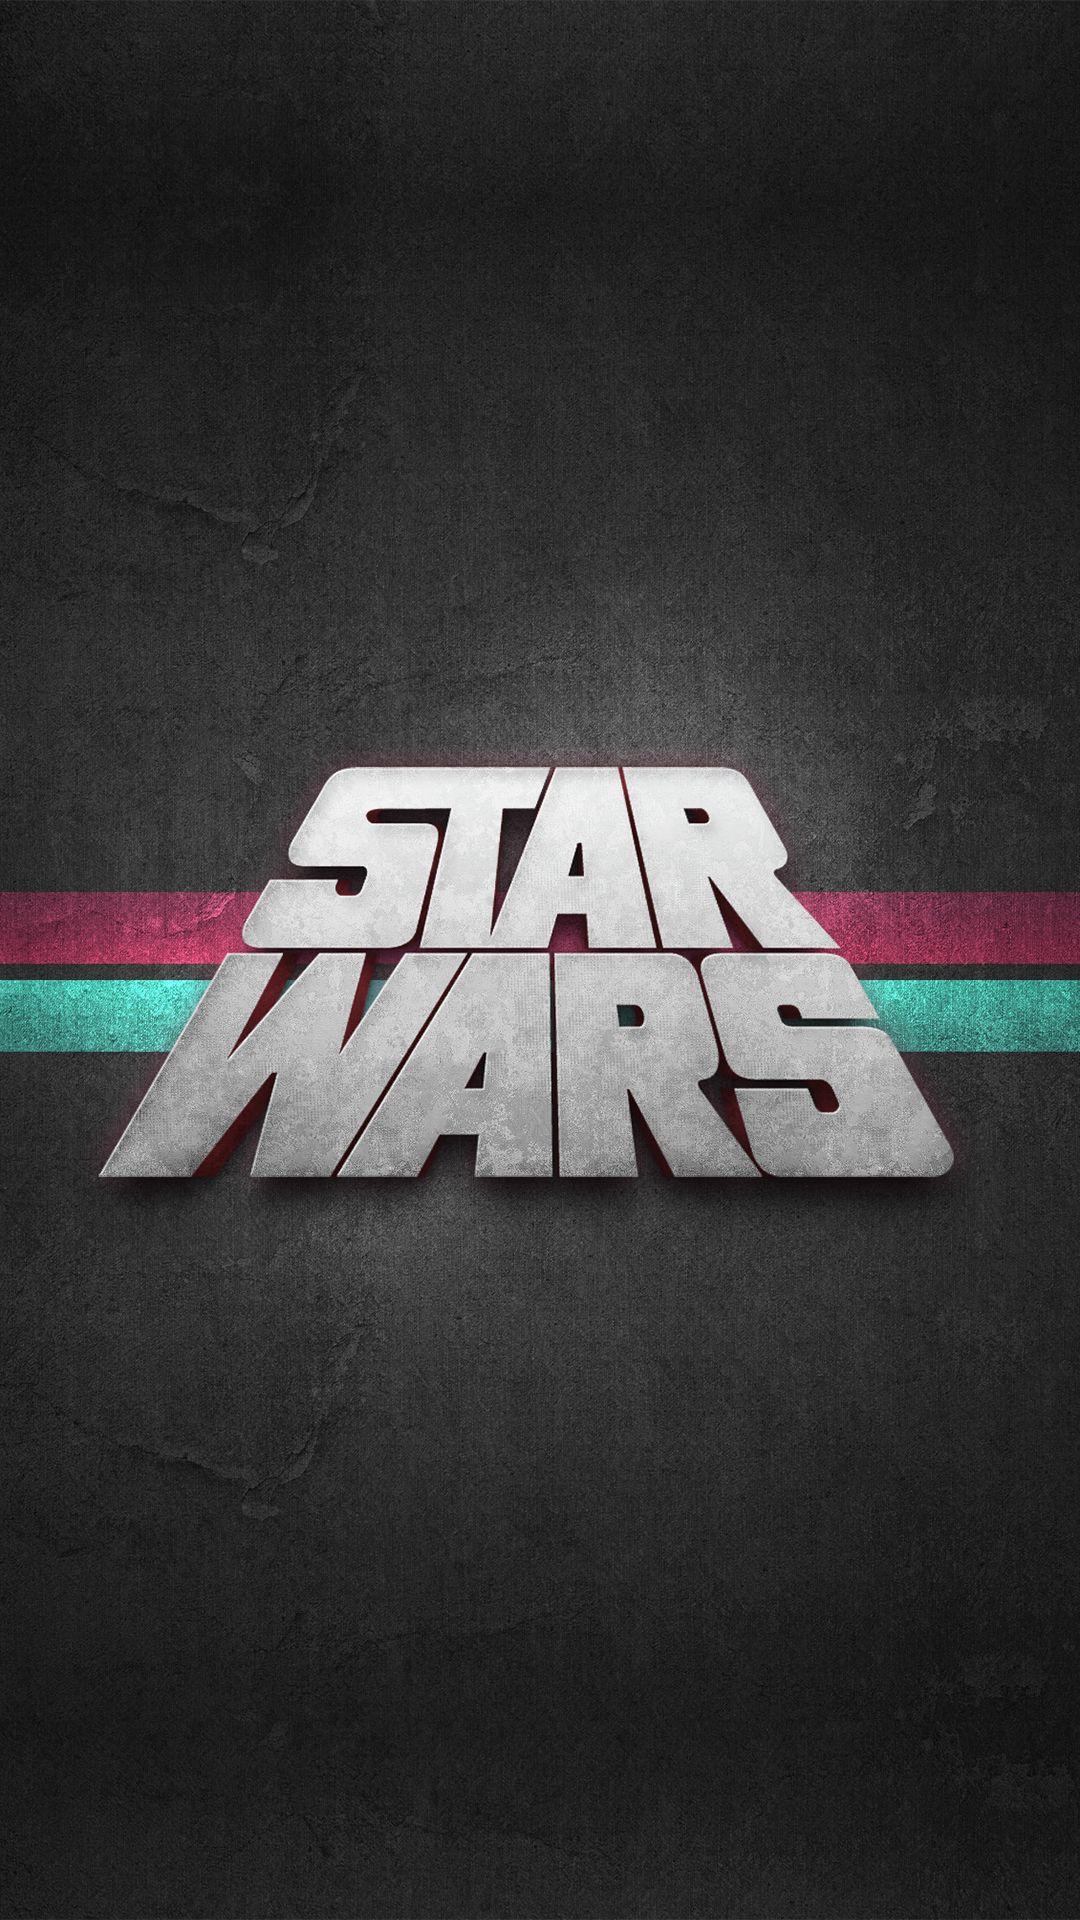 Star Wars Darth Vader Spaceships Android Wallpaper Free Download Star Wars Wallpaper Star Wars Poster Star Wars Art